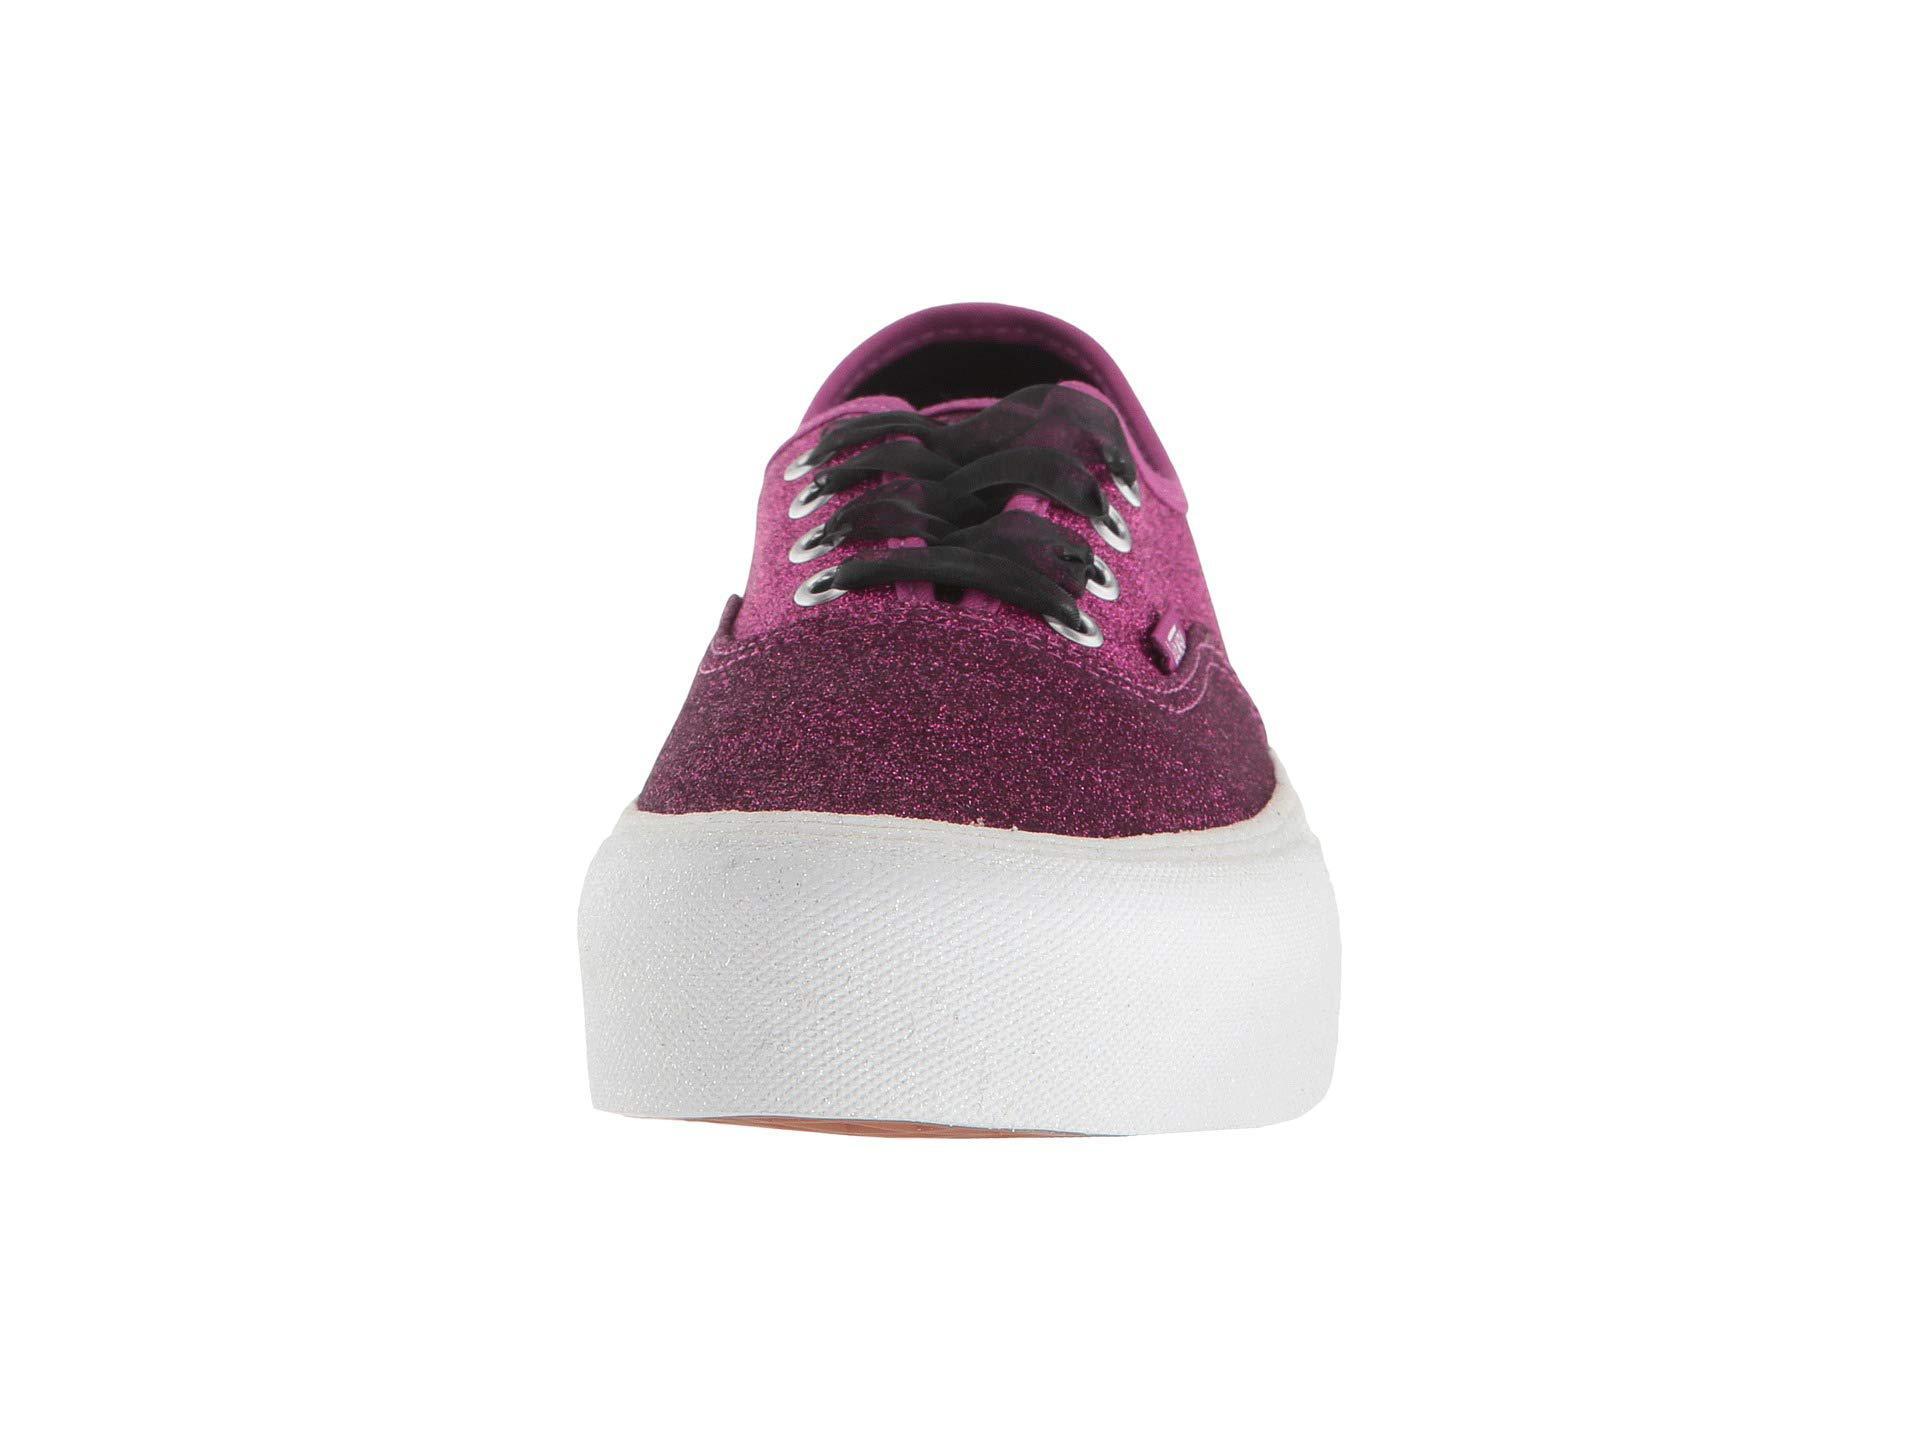 d9f647f1eab Vans - Purple Authentic Platform 2.0 ((leather) Snake black) Skate Shoes.  View fullscreen